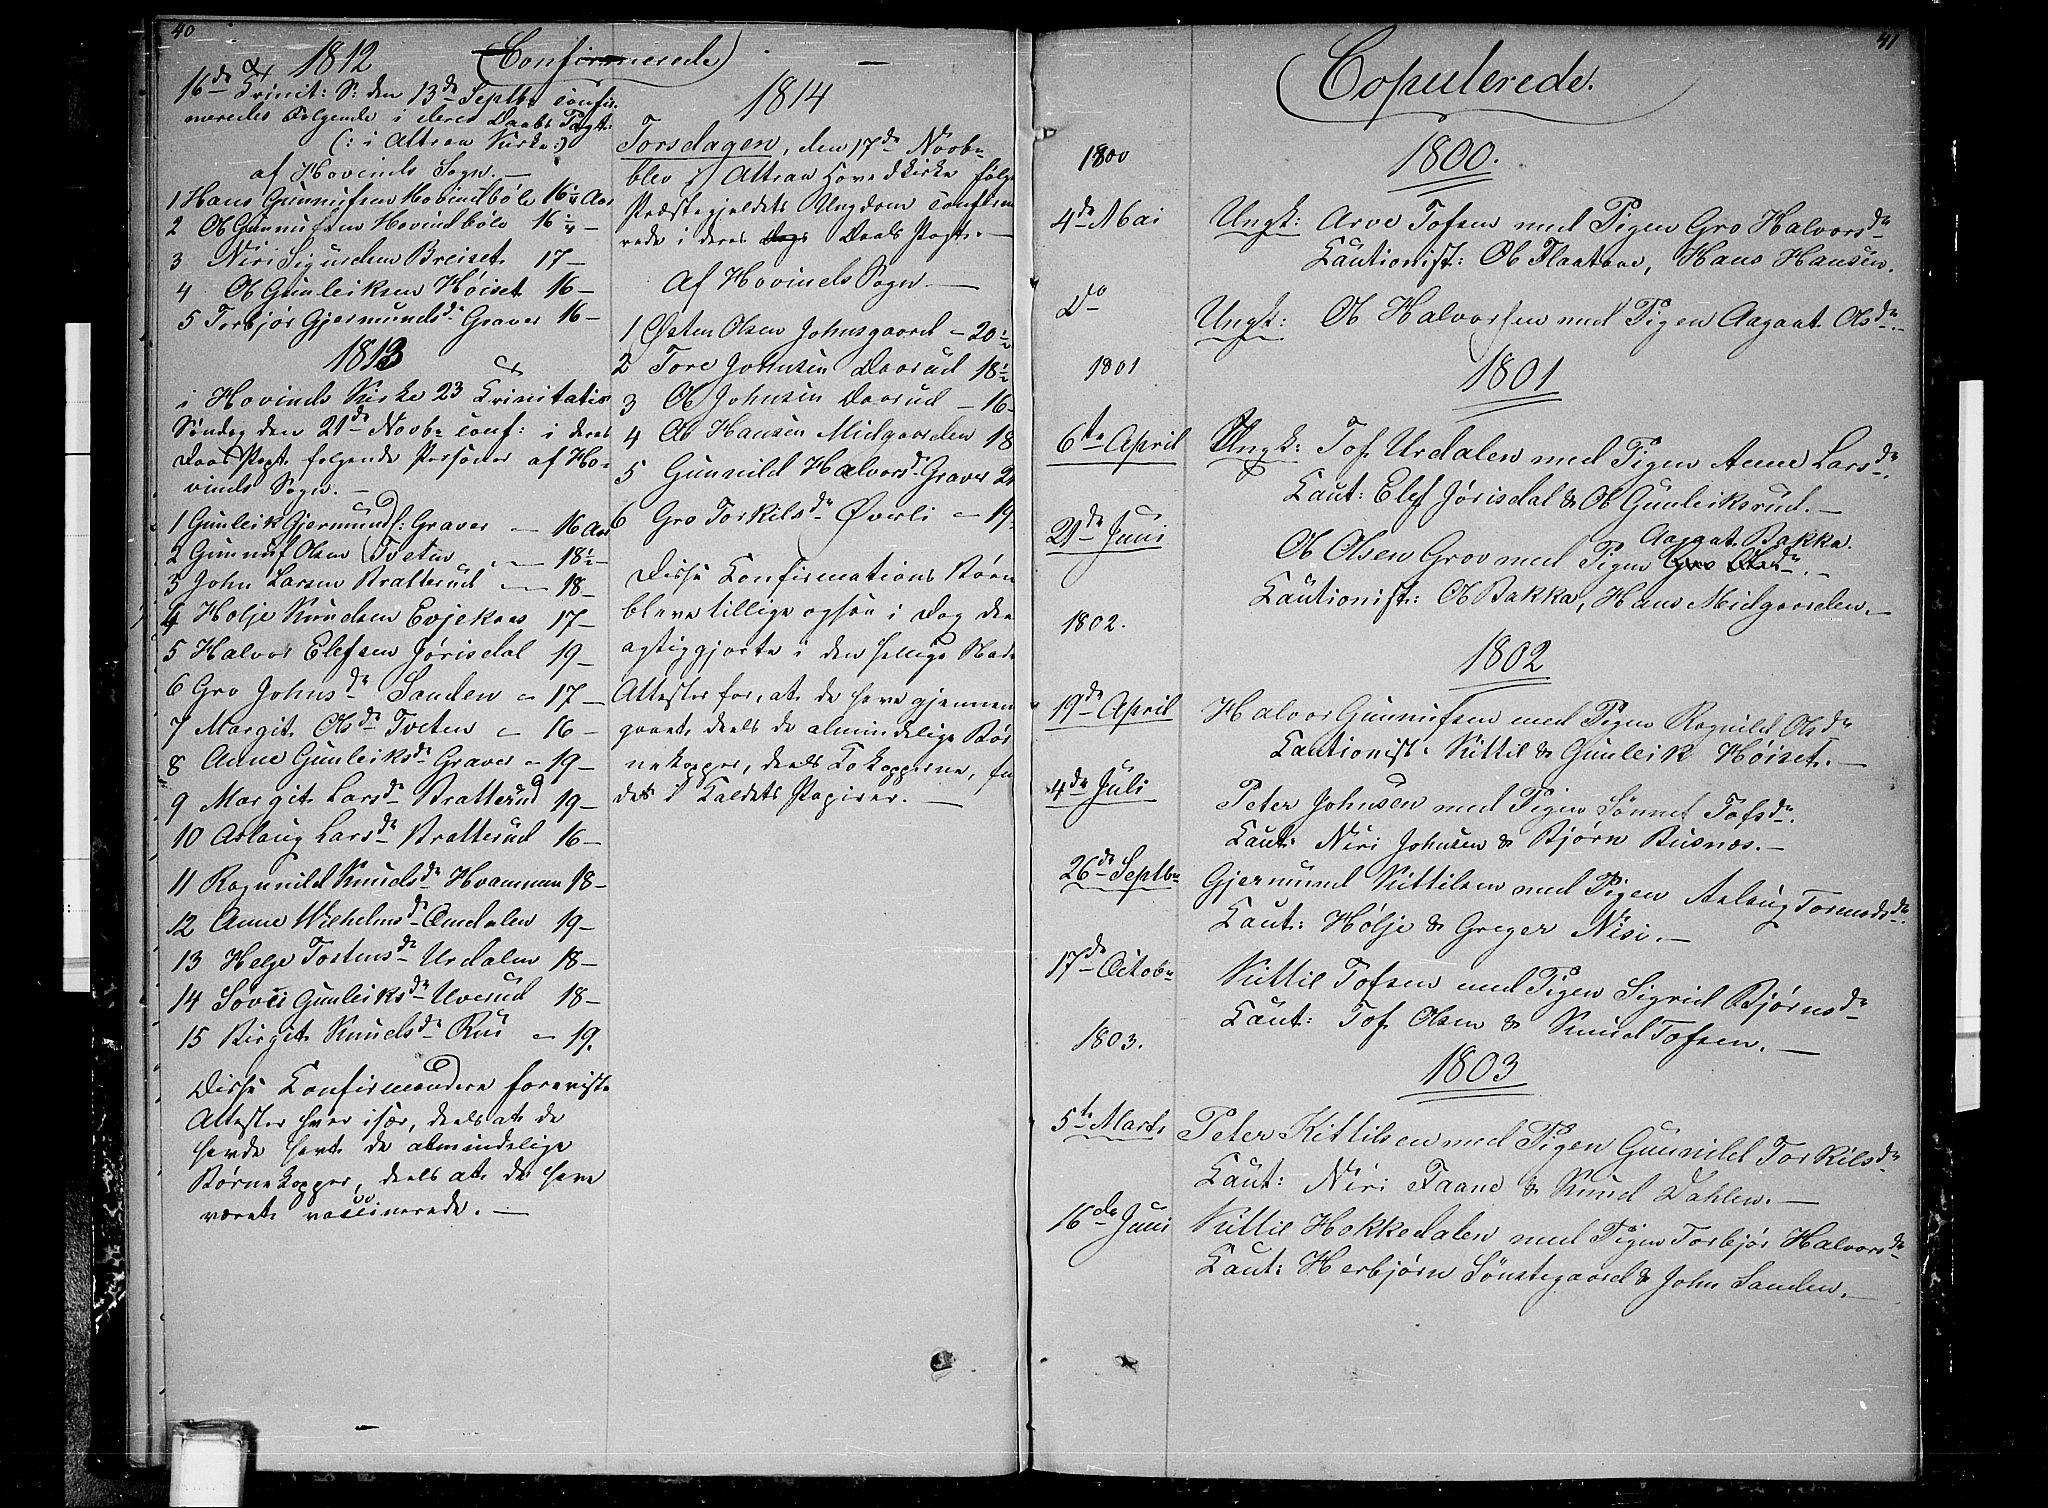 SAKO, Gransherad kirkebøker, F/Fb/L0001: Ministerialbok nr. II 1, 1800-1814, s. 40-41